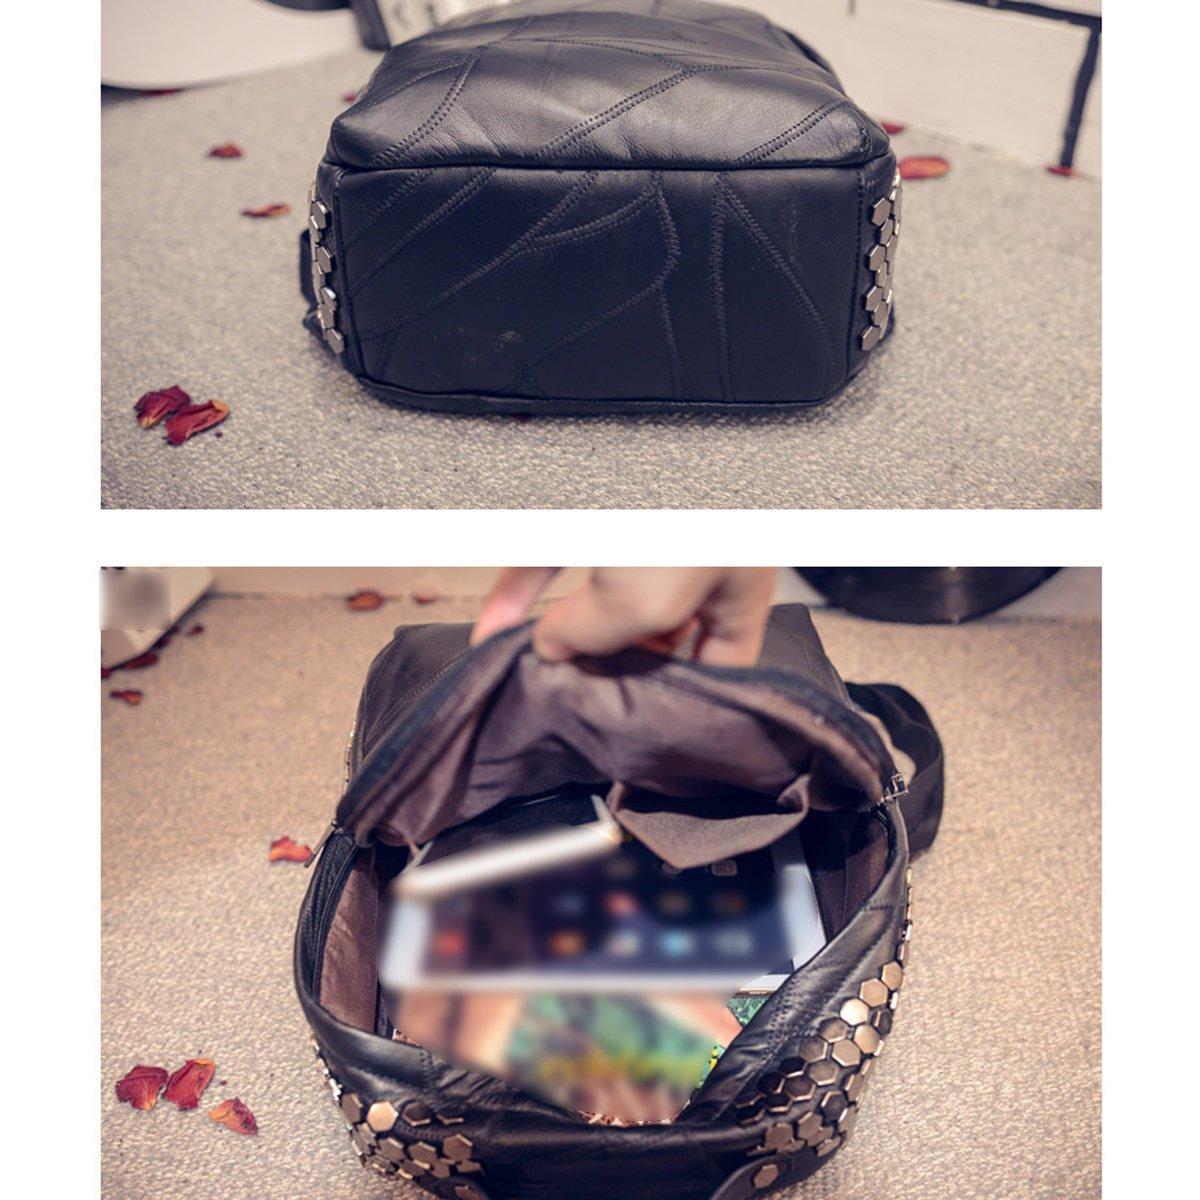 Woman PU backpack New Style Shoulder Bag Leisure Travel Bag Large Capacity Bag